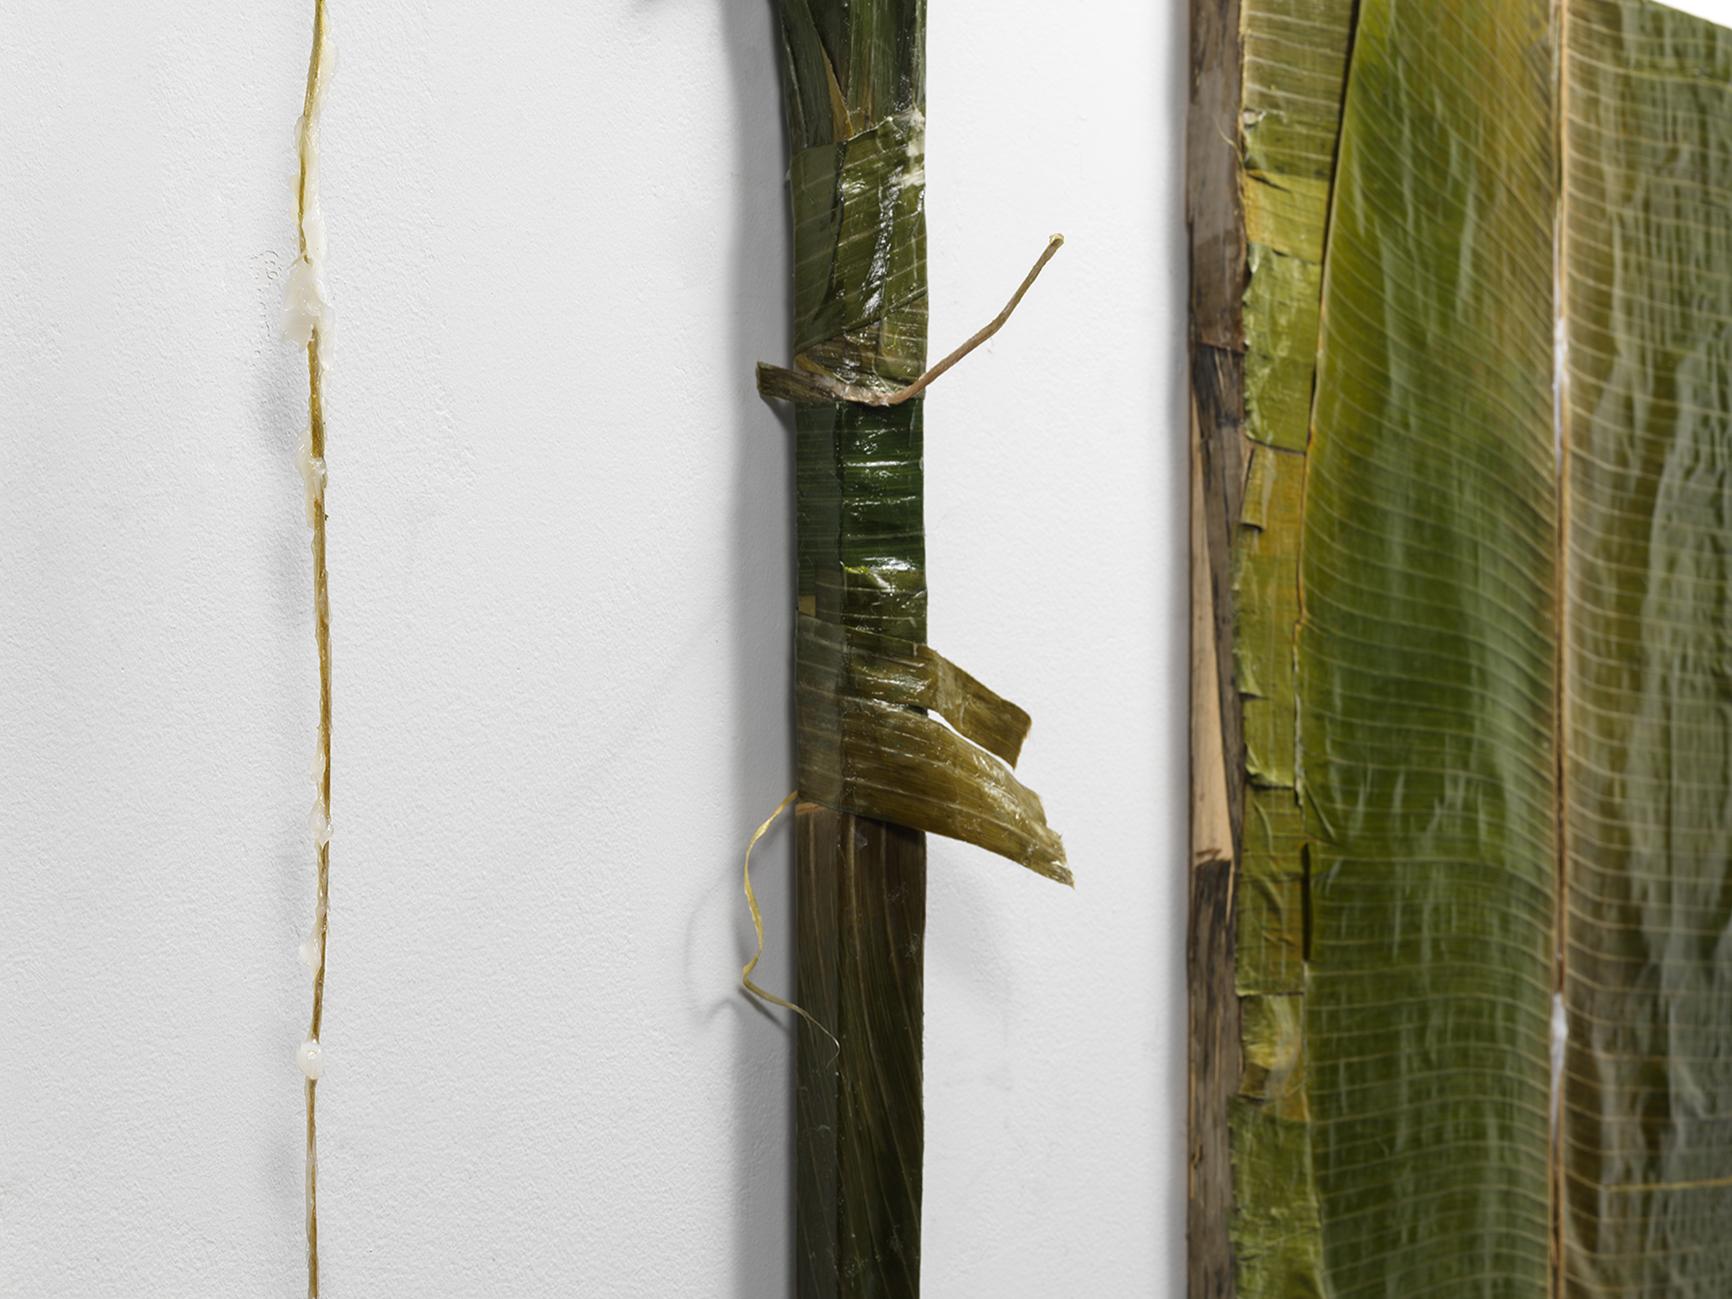 """Colgão Diptych"" (detail)  petrolatum (Vicks VapoRub) on plantain leaves lined with resin,  36 x 24 in.each  2017"